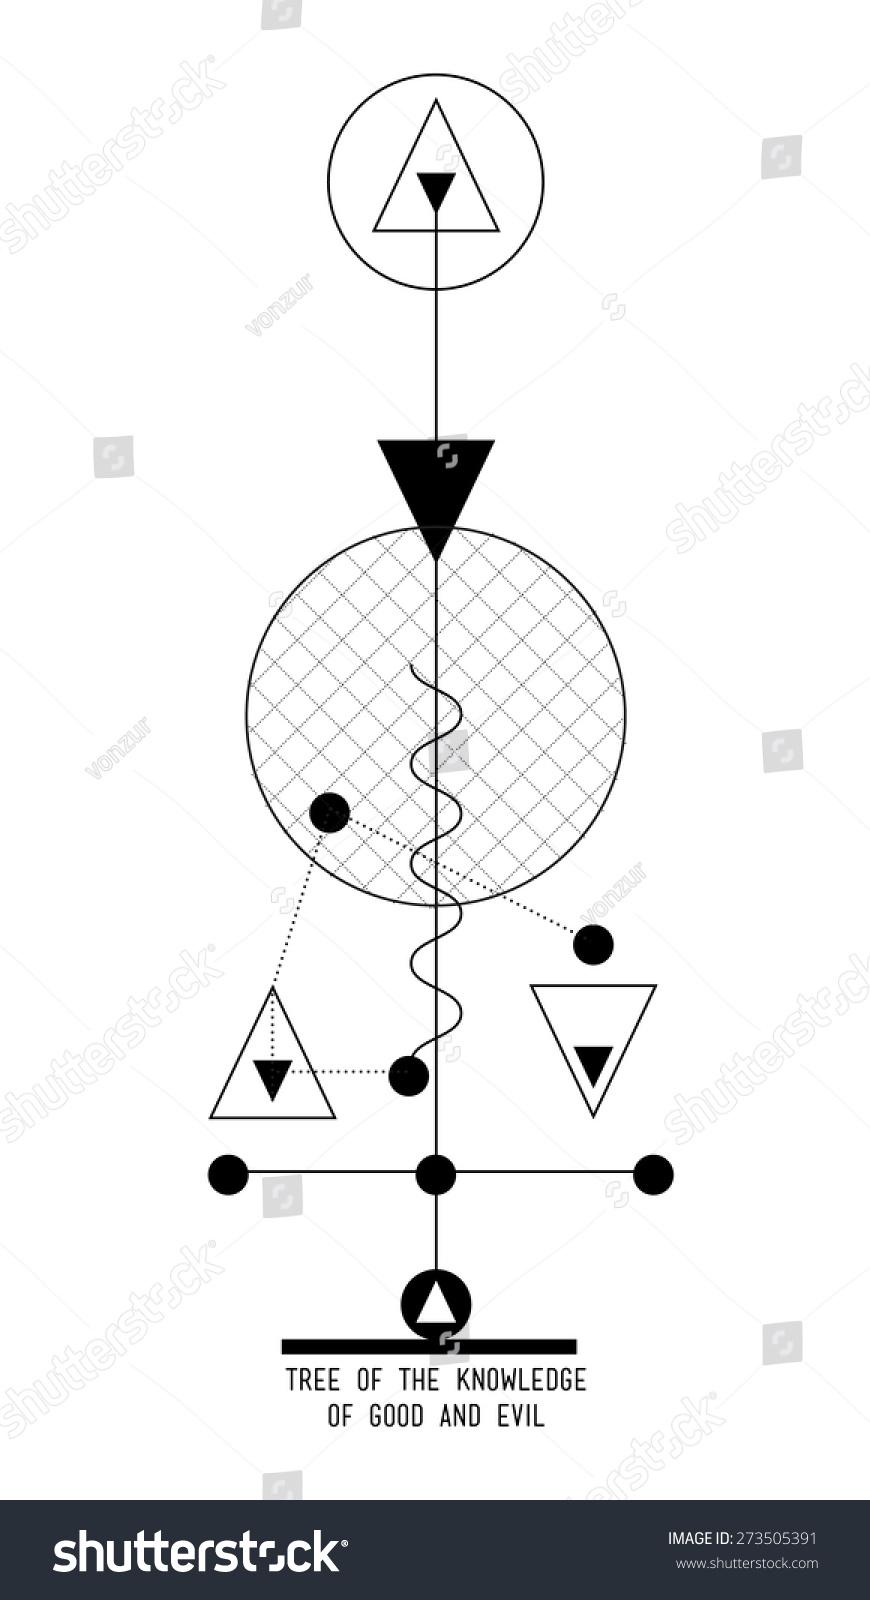 Tree knowledge good evil abstract geometric stock vector for Tree of knowledge of good and evil tattoo